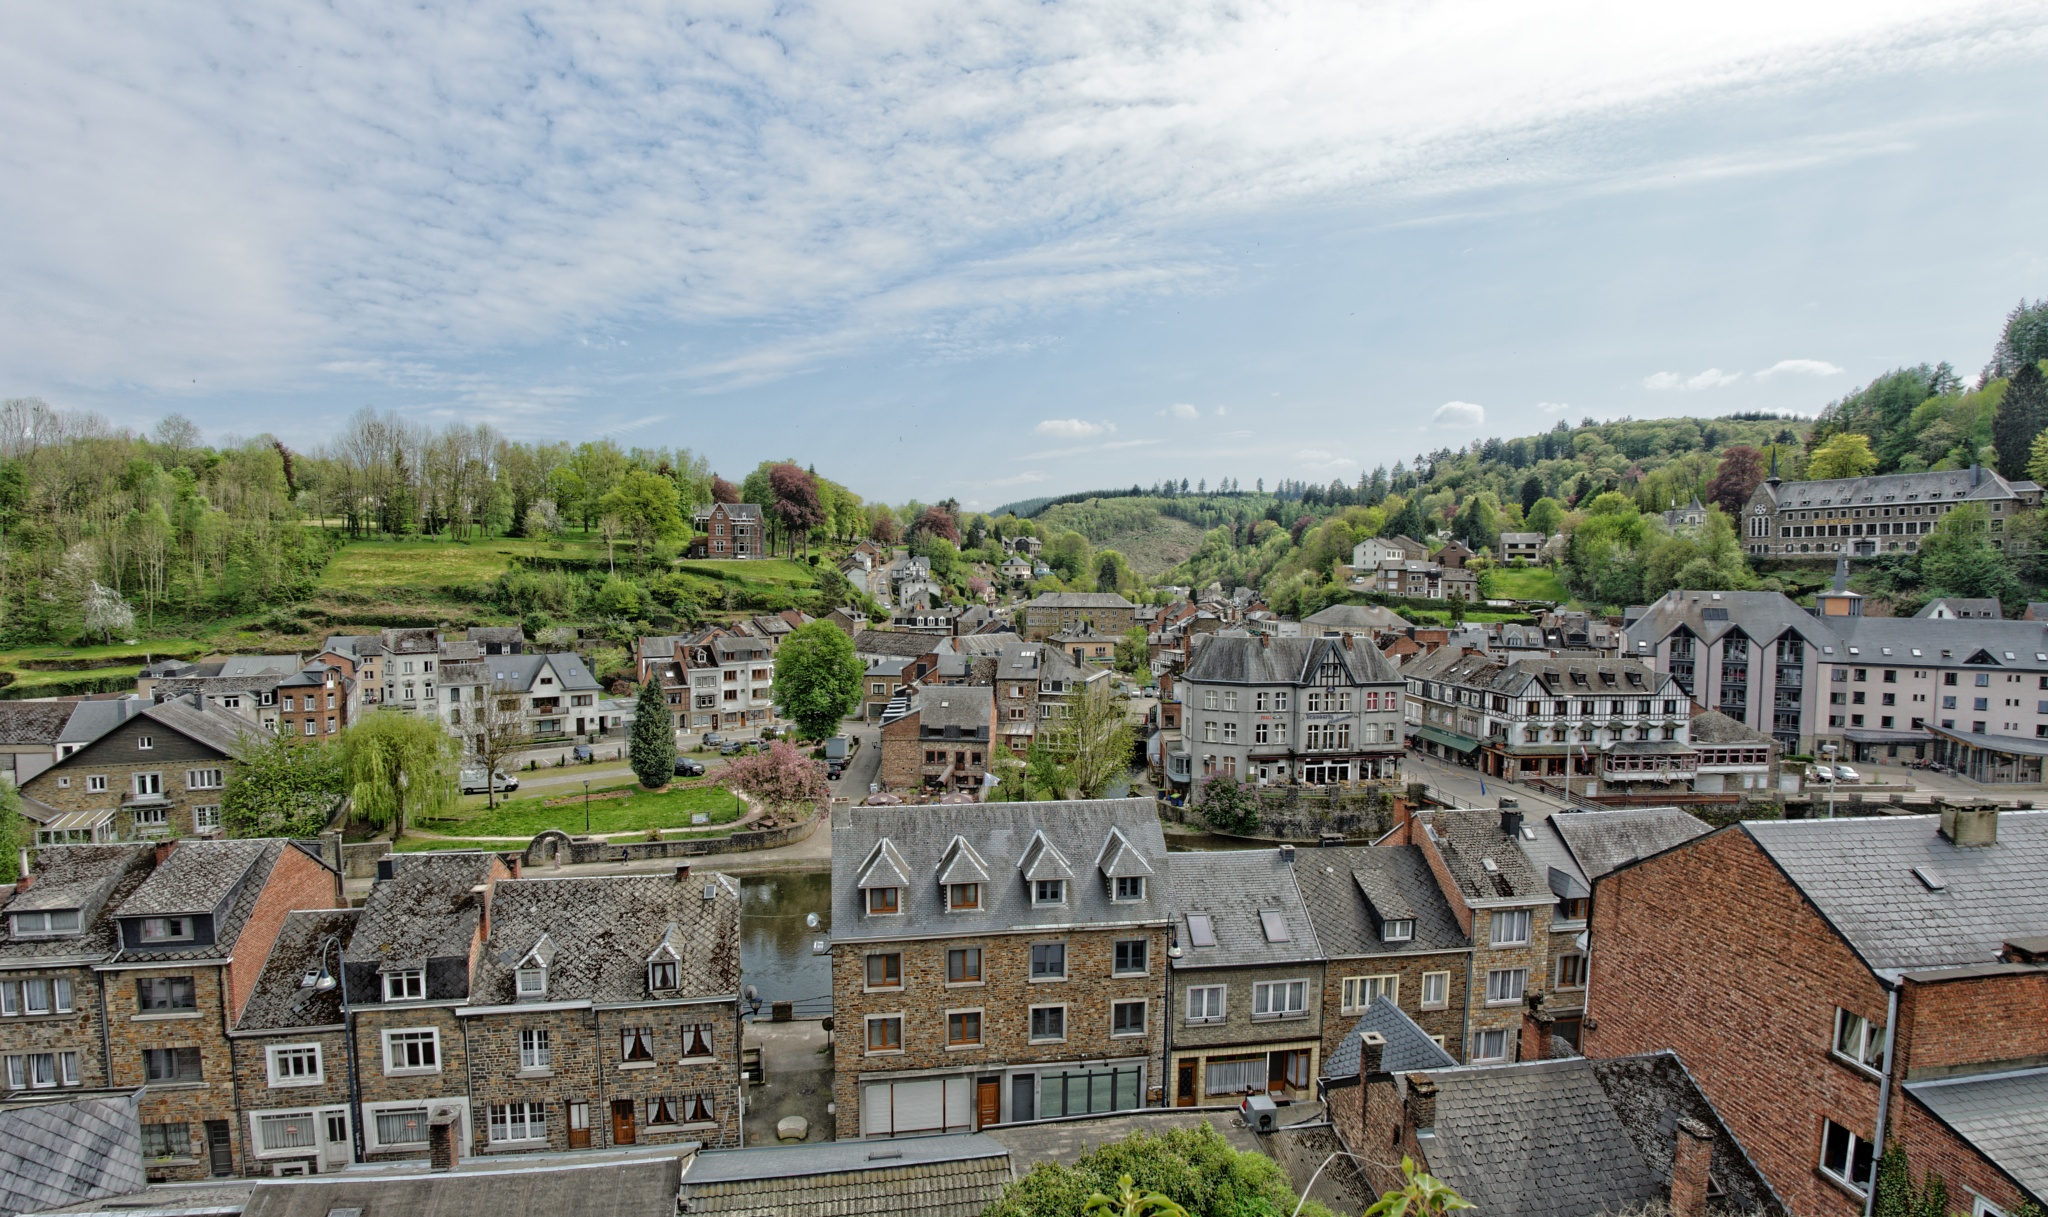 Miniature city 'corrected' by Edgar 't Hart